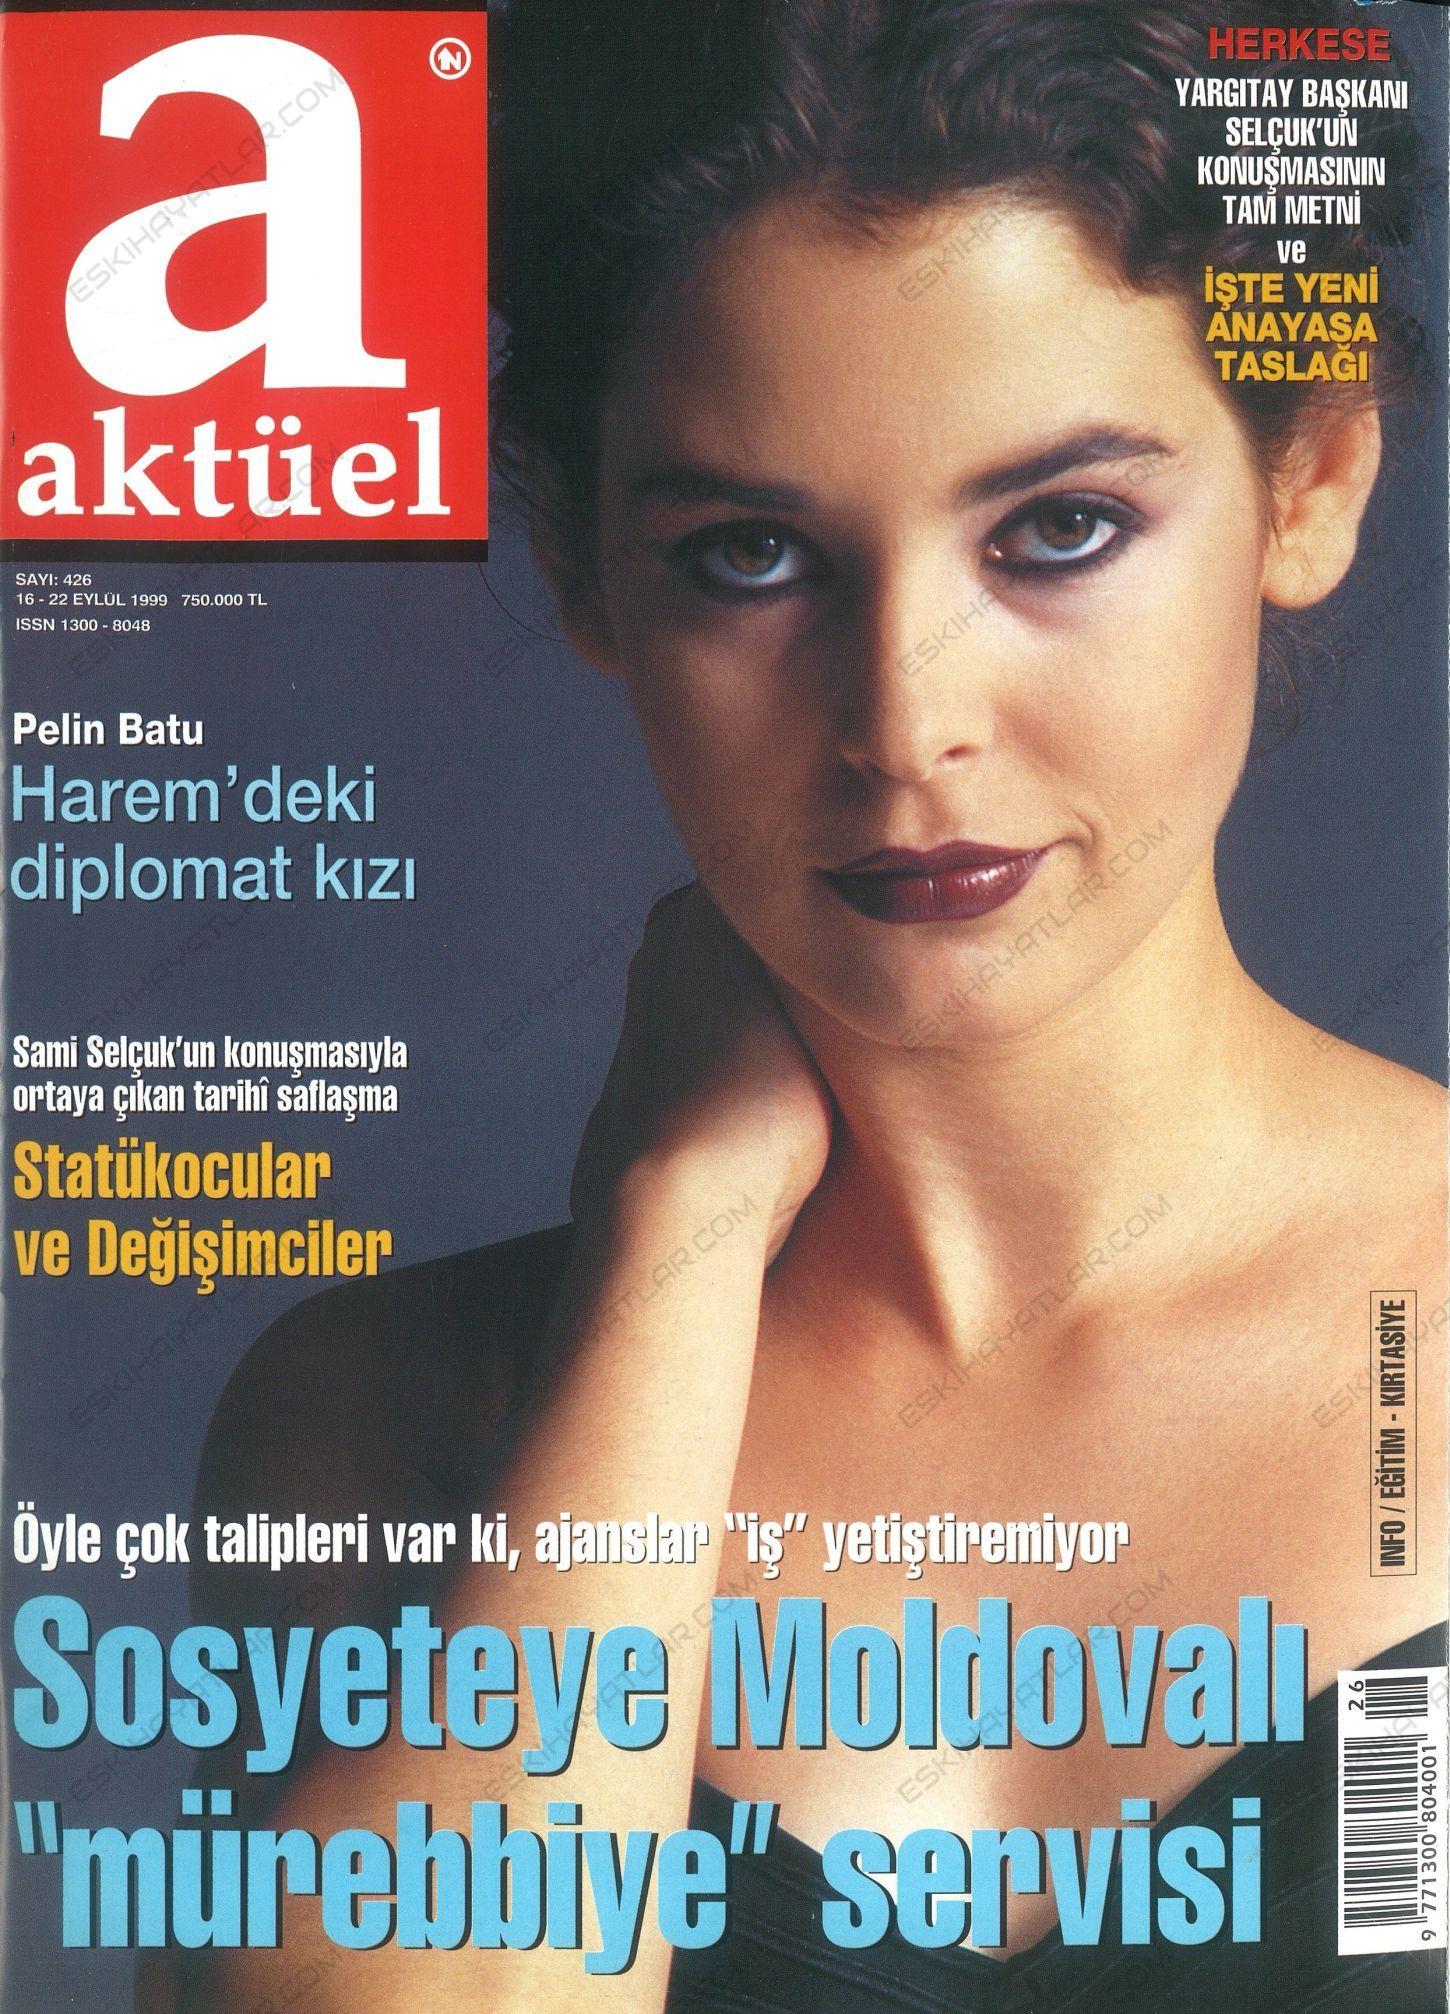 0340-internet-chat-odalari-mIRC-zurna-kanali-travestiler-1999-aktuel-dergisi (6)